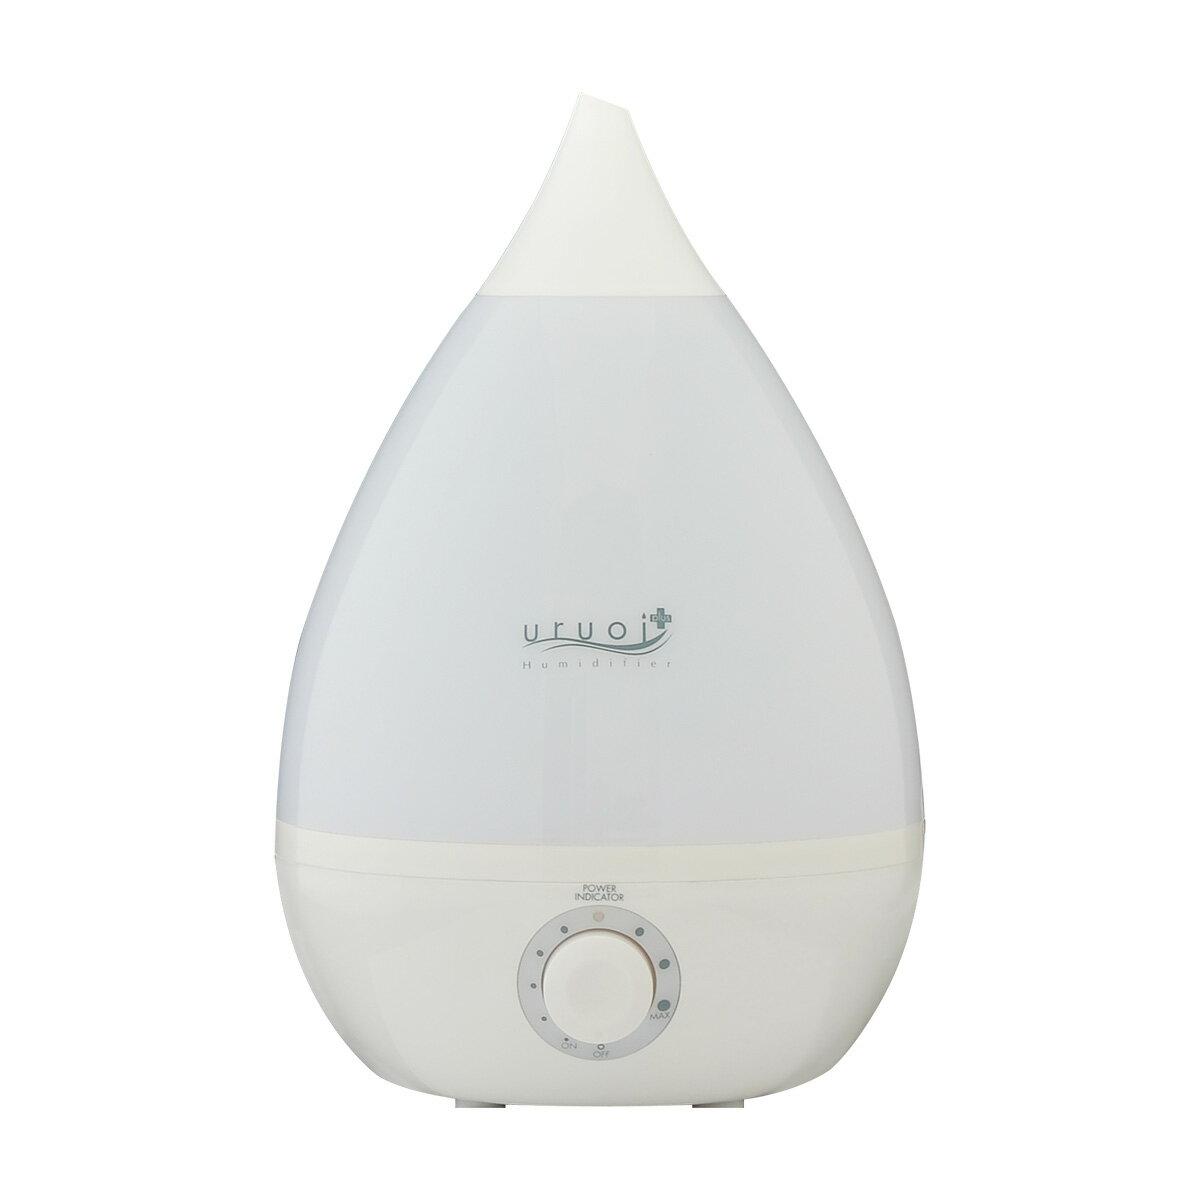 uruoi+ 超音波式 アロマ加湿器 3Lタイプ ドロップ型の写真